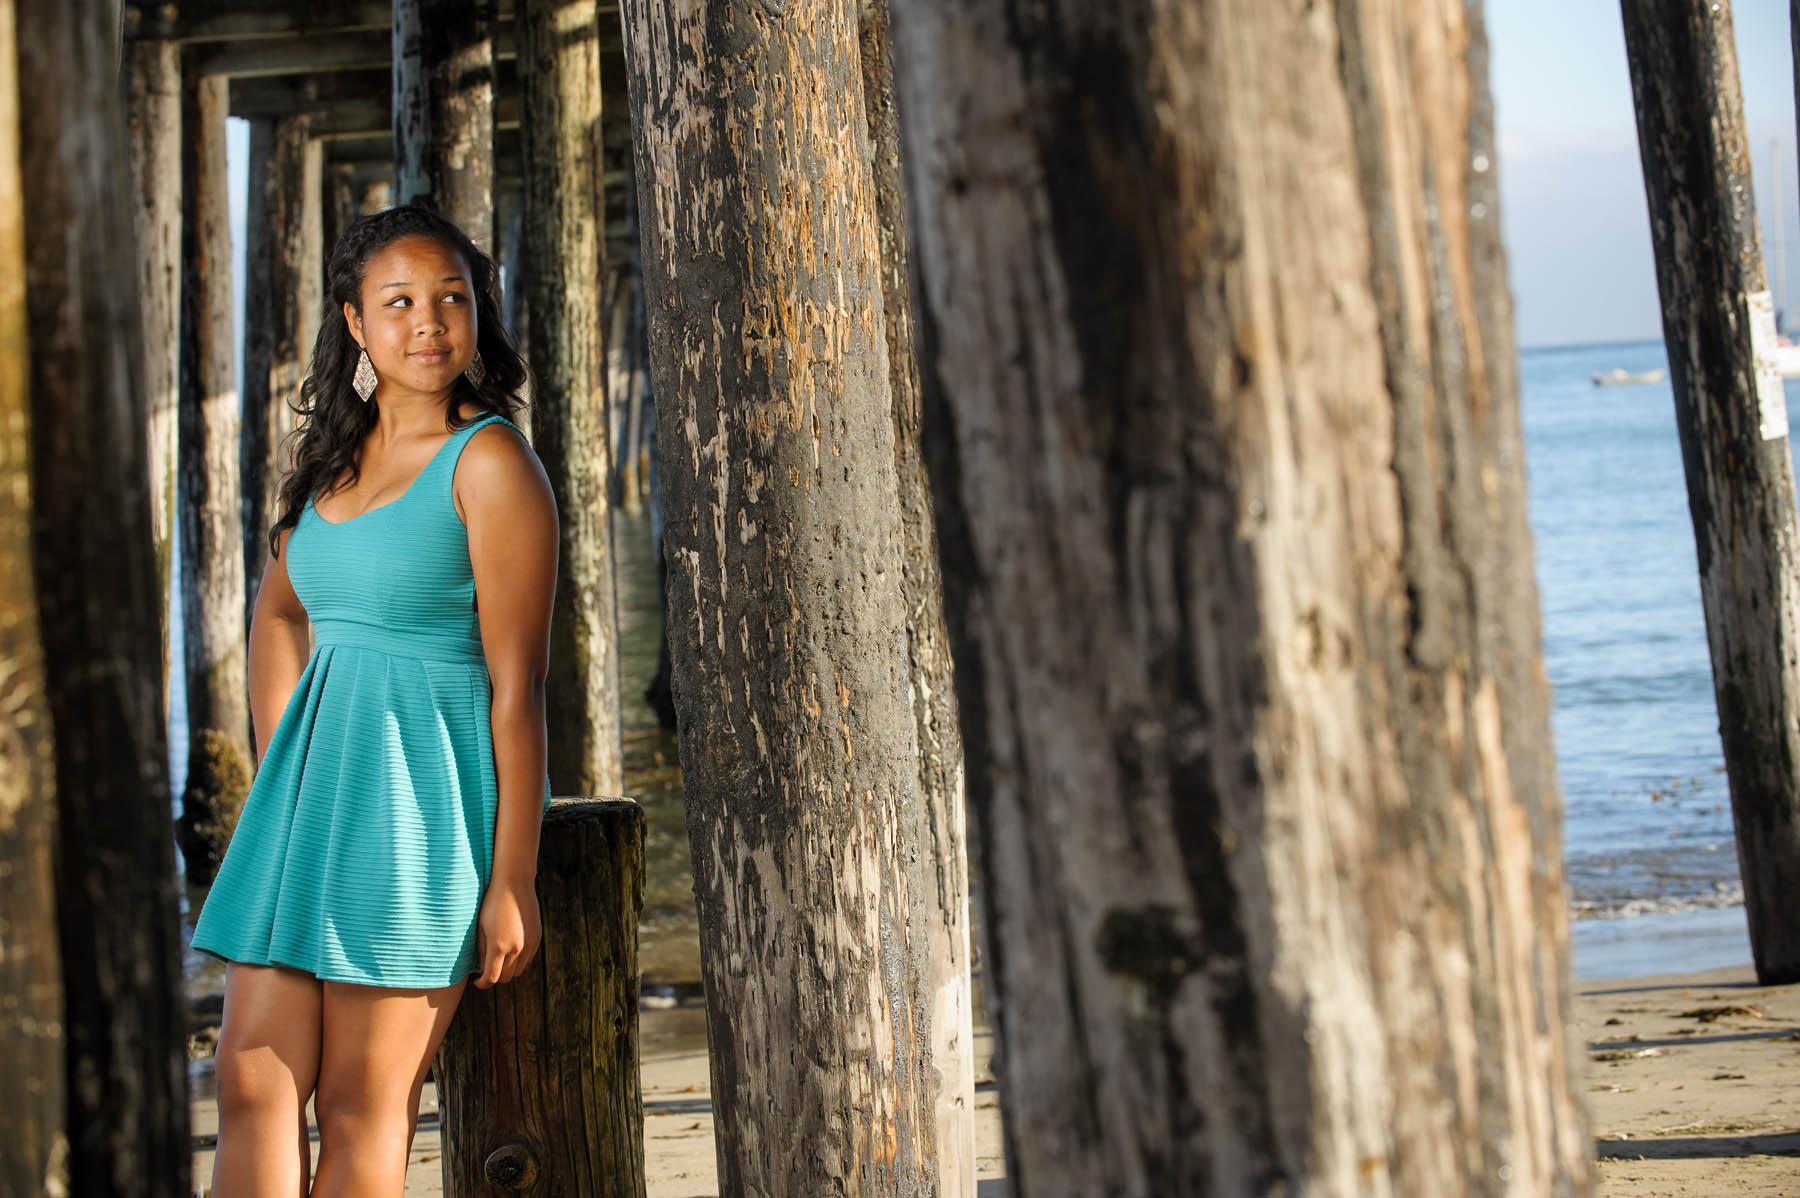 7283-d3_Mileena_Capitola_Beach_High_School_Senior_Portrait_Photography.jpg